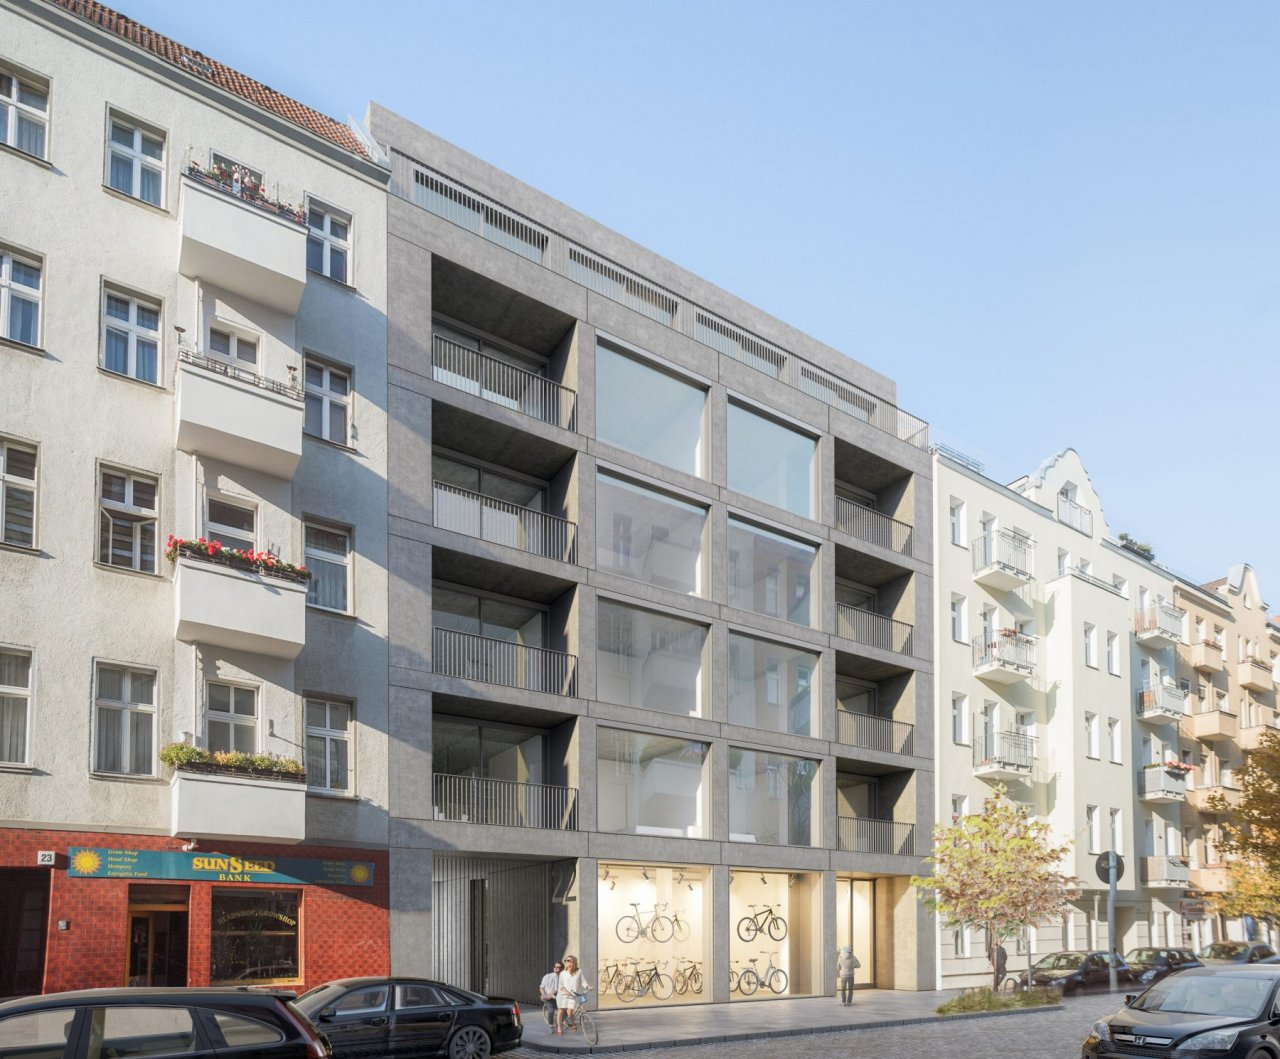 Bundschuh-Amsterdamer-Strasse-22-Neubau.jpg